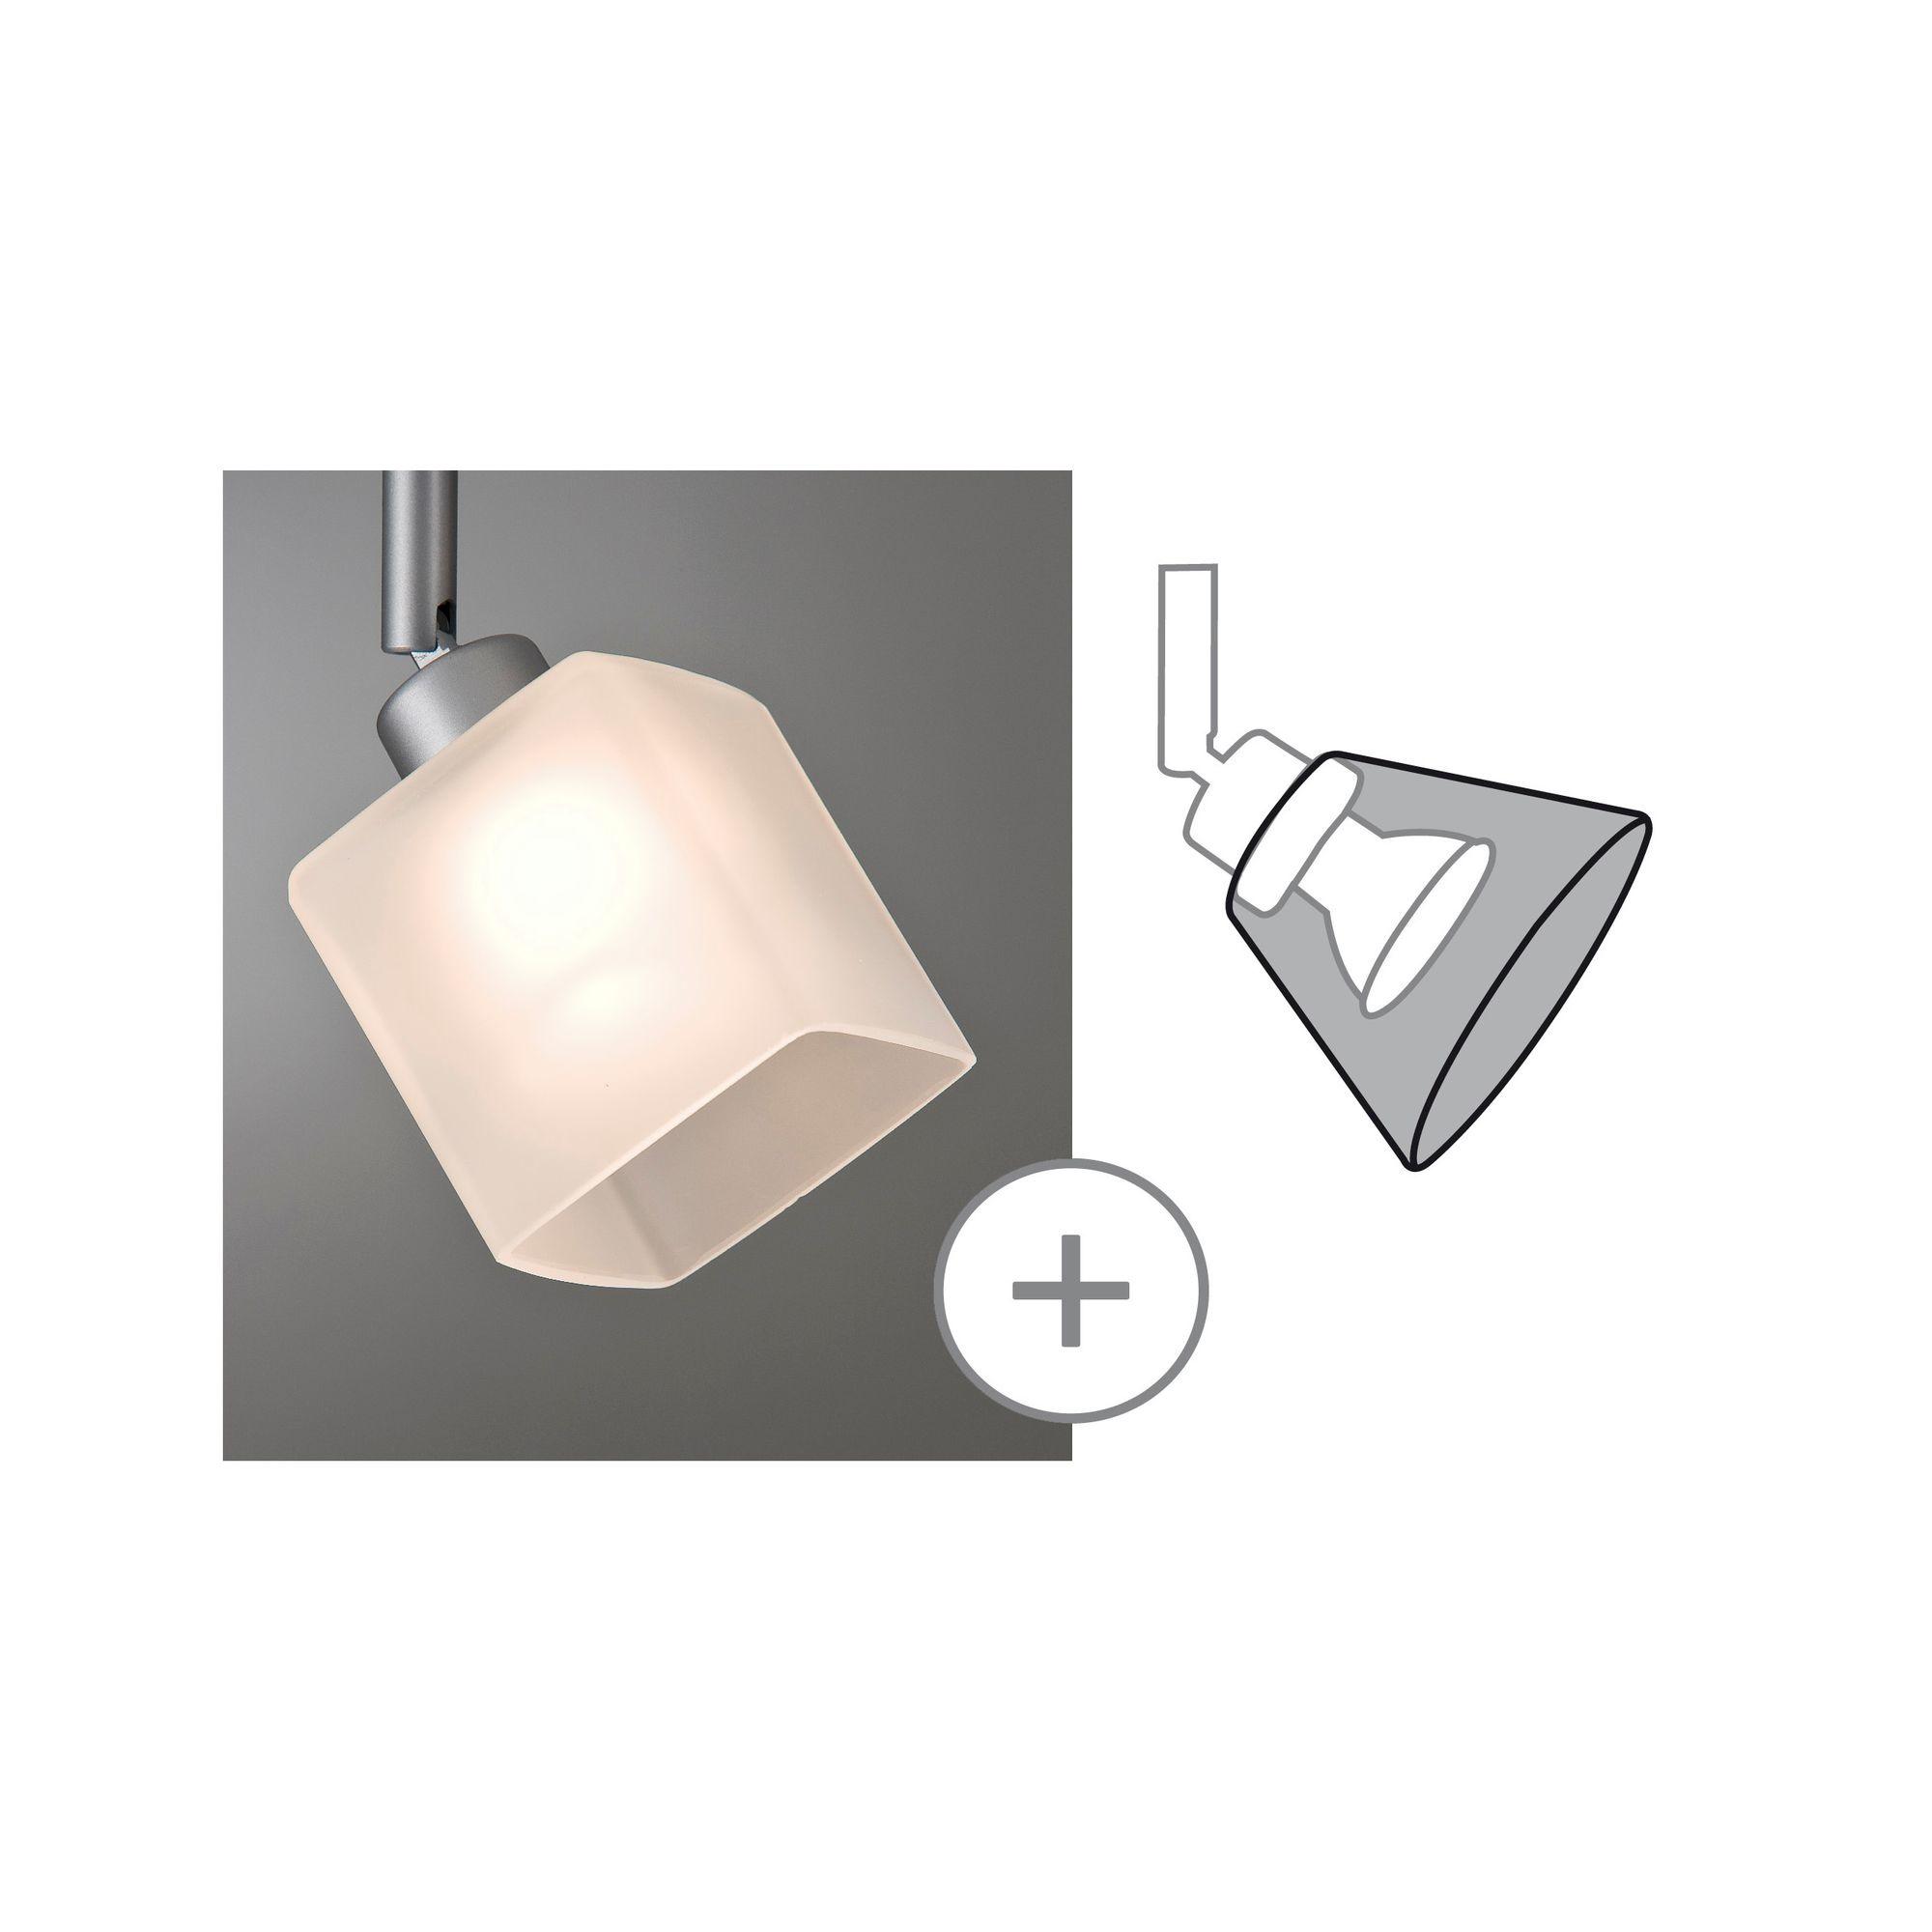 Paulmann DecoSystems Schirm Quad max.50W Glas Weiß